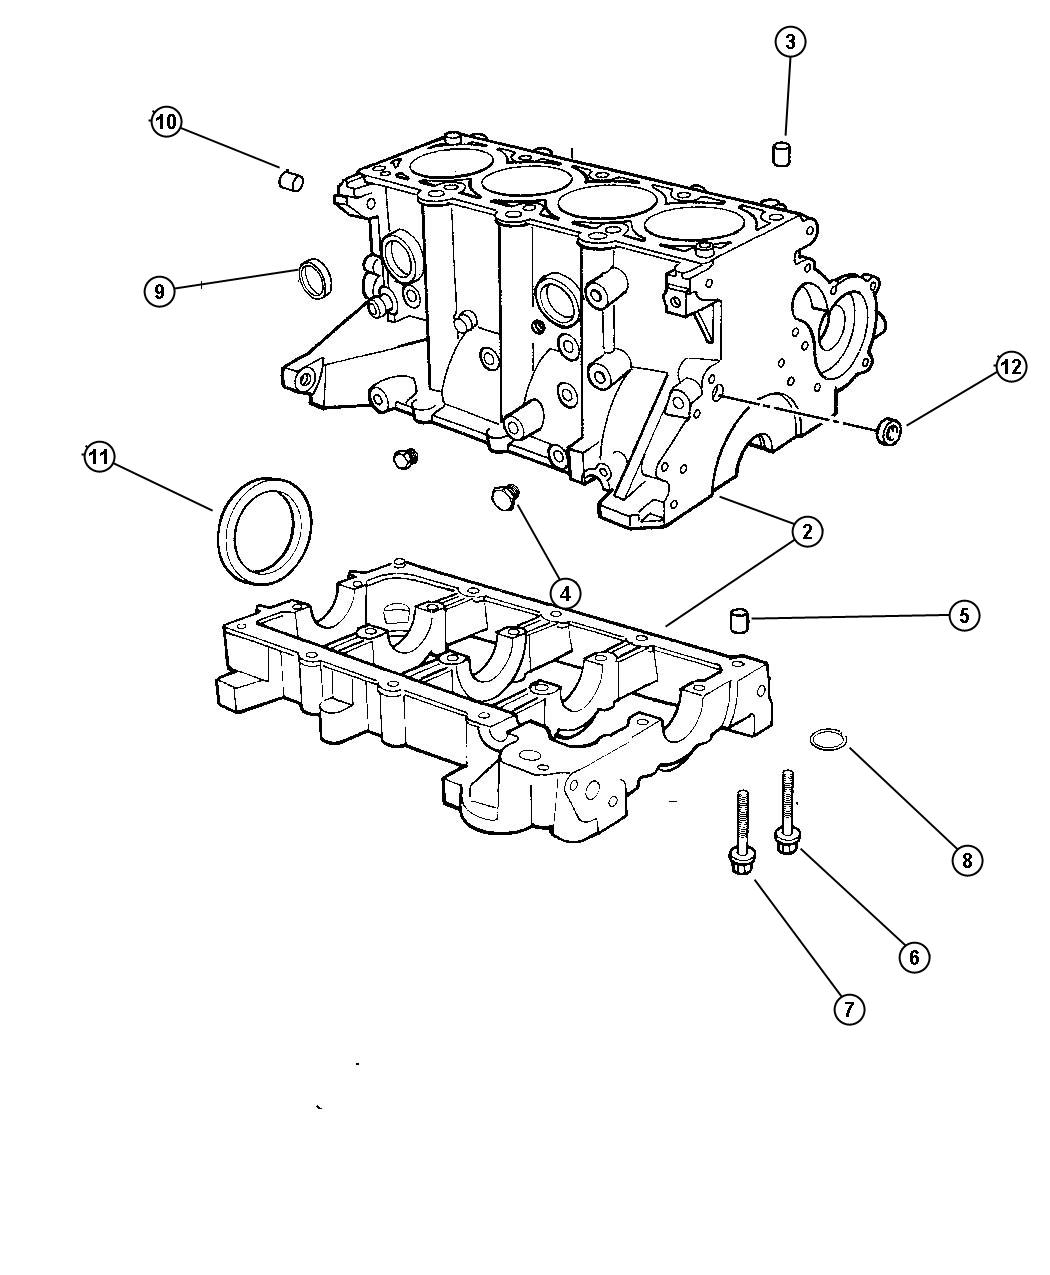 Dodge Neon Dowel Dowel Pin Engine Block To Bedplate